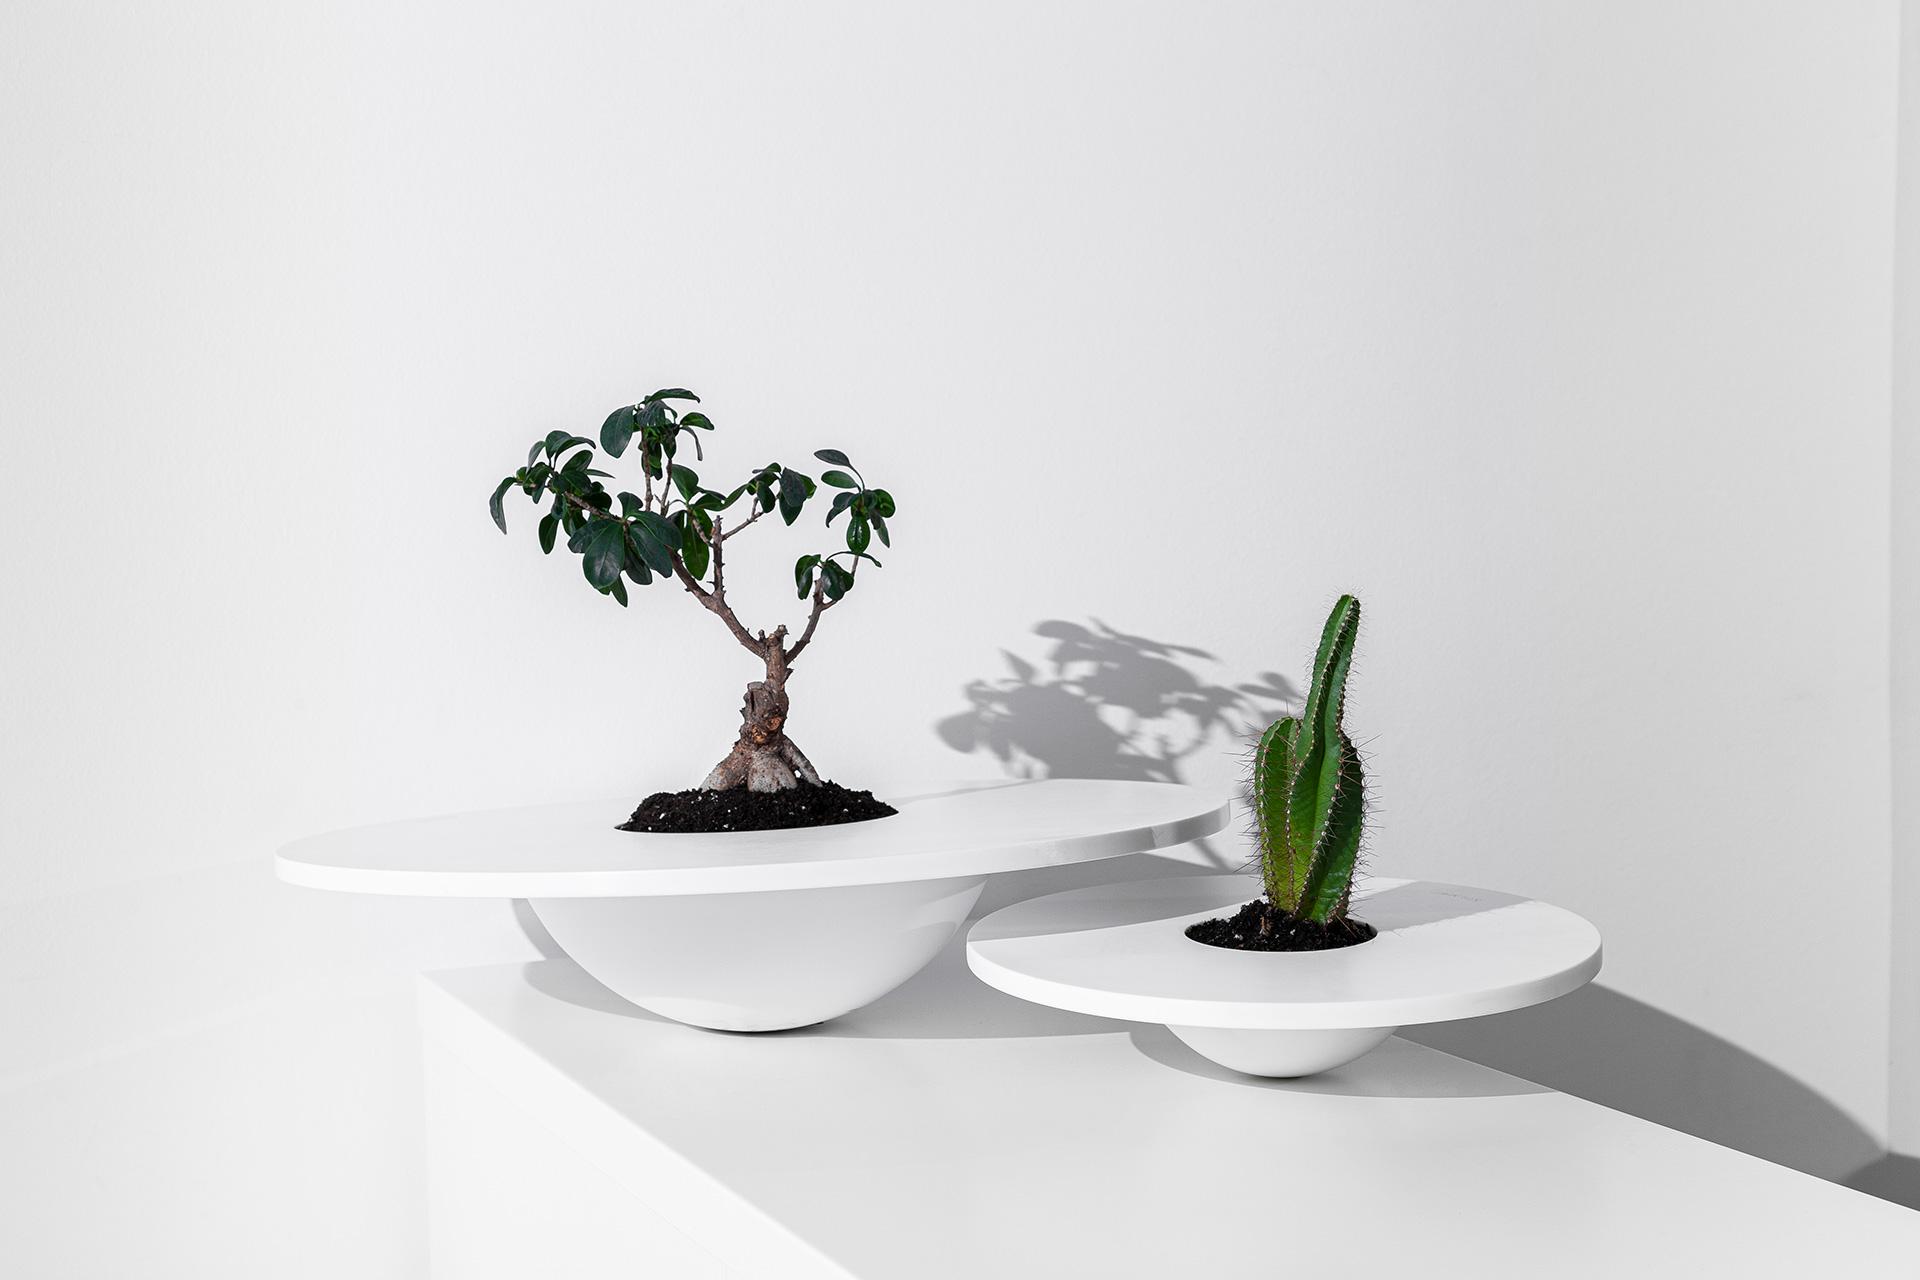 Hat_Vase Two Pots - DESIGN BY MIGUEL SOEIRO